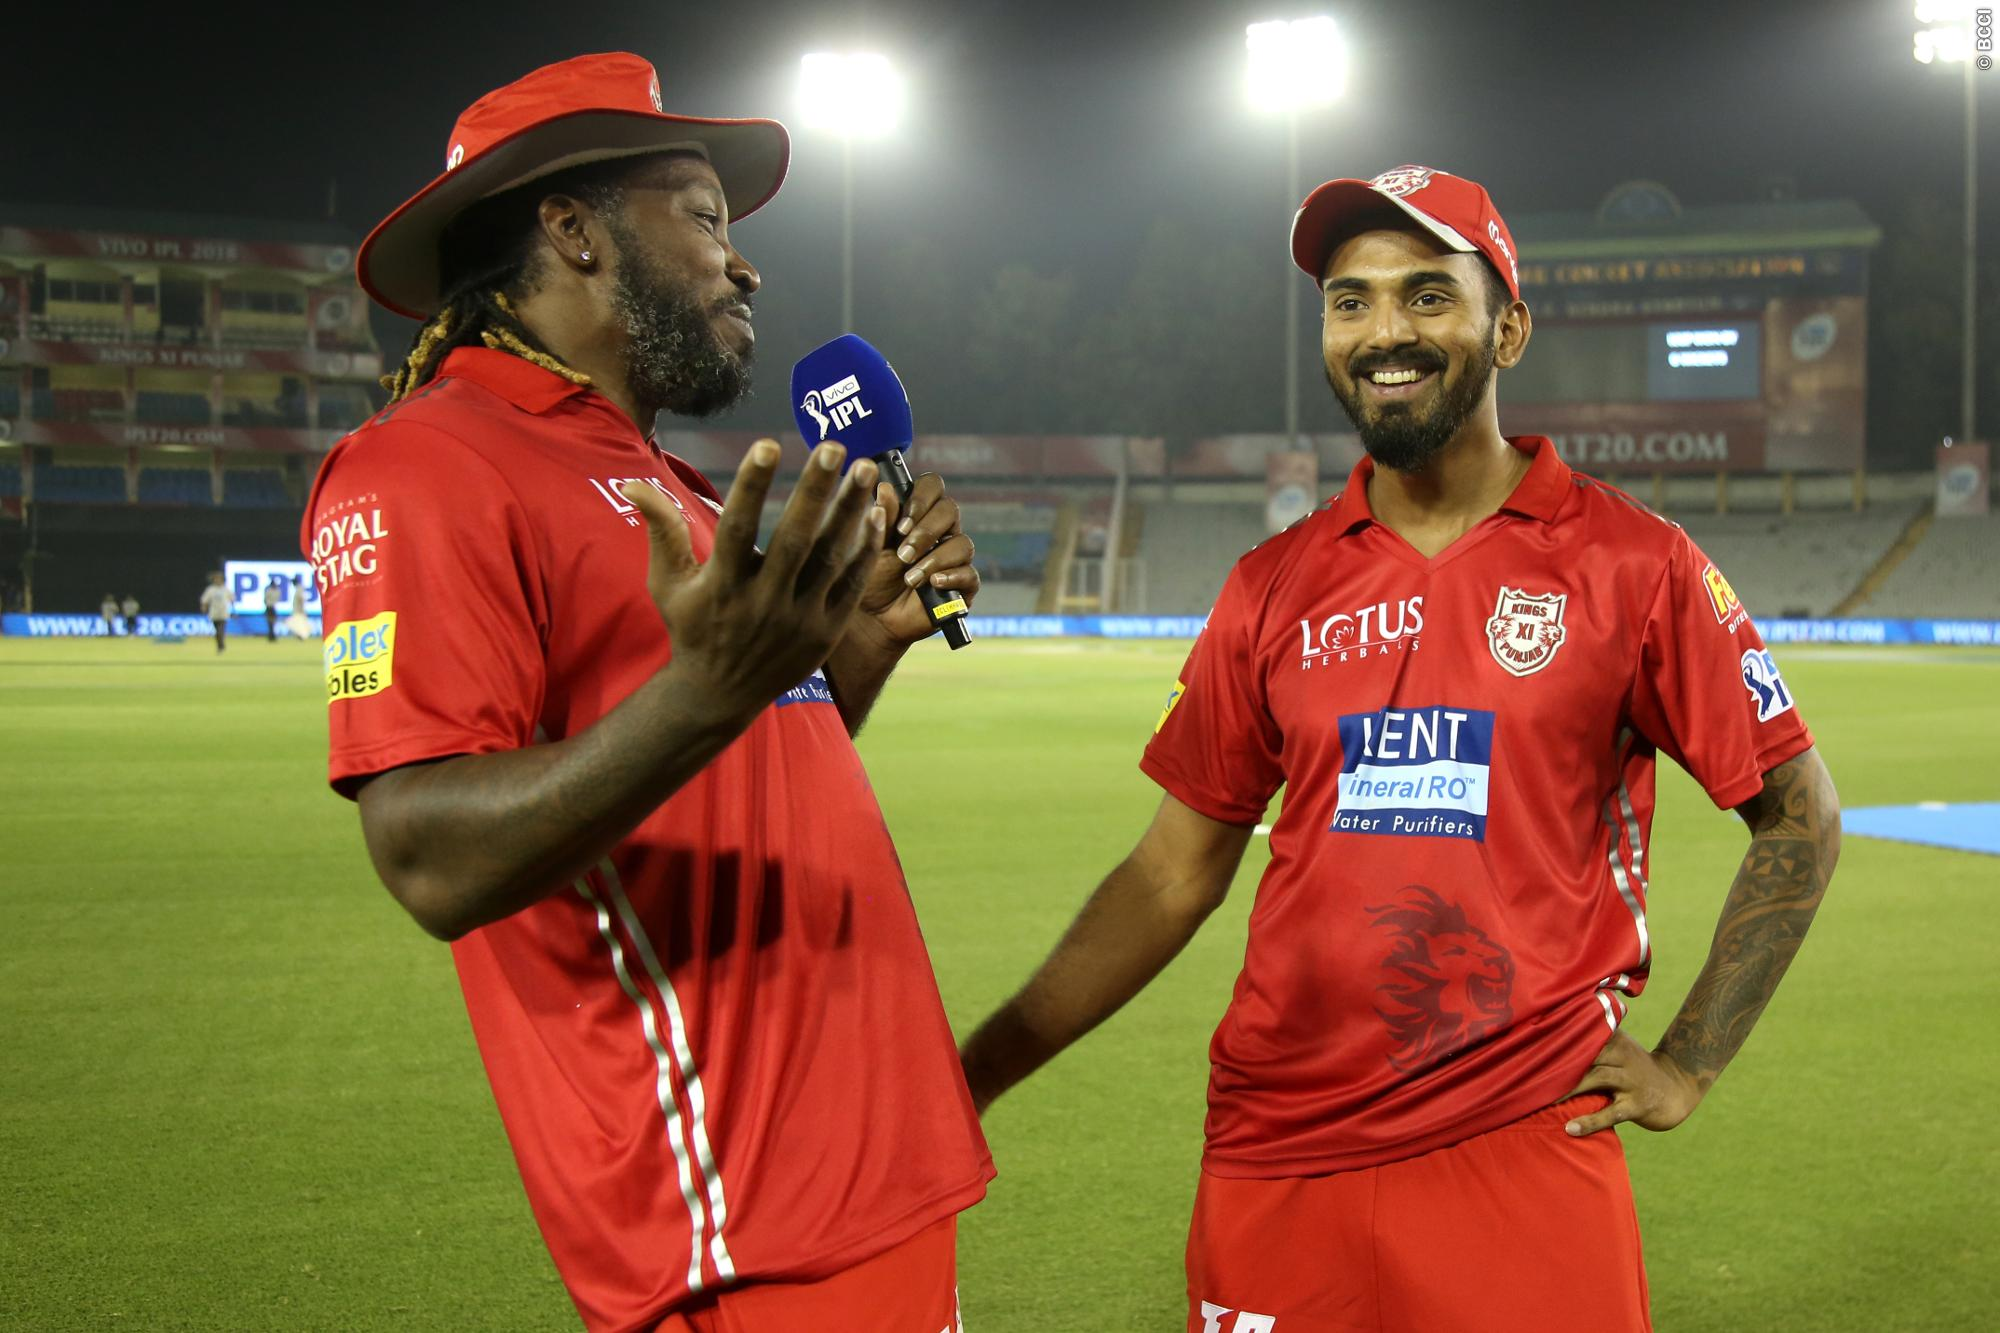 Chris Gayle and KL Rahul share a light moment during IPL 11. (Image: IPLT20.com)